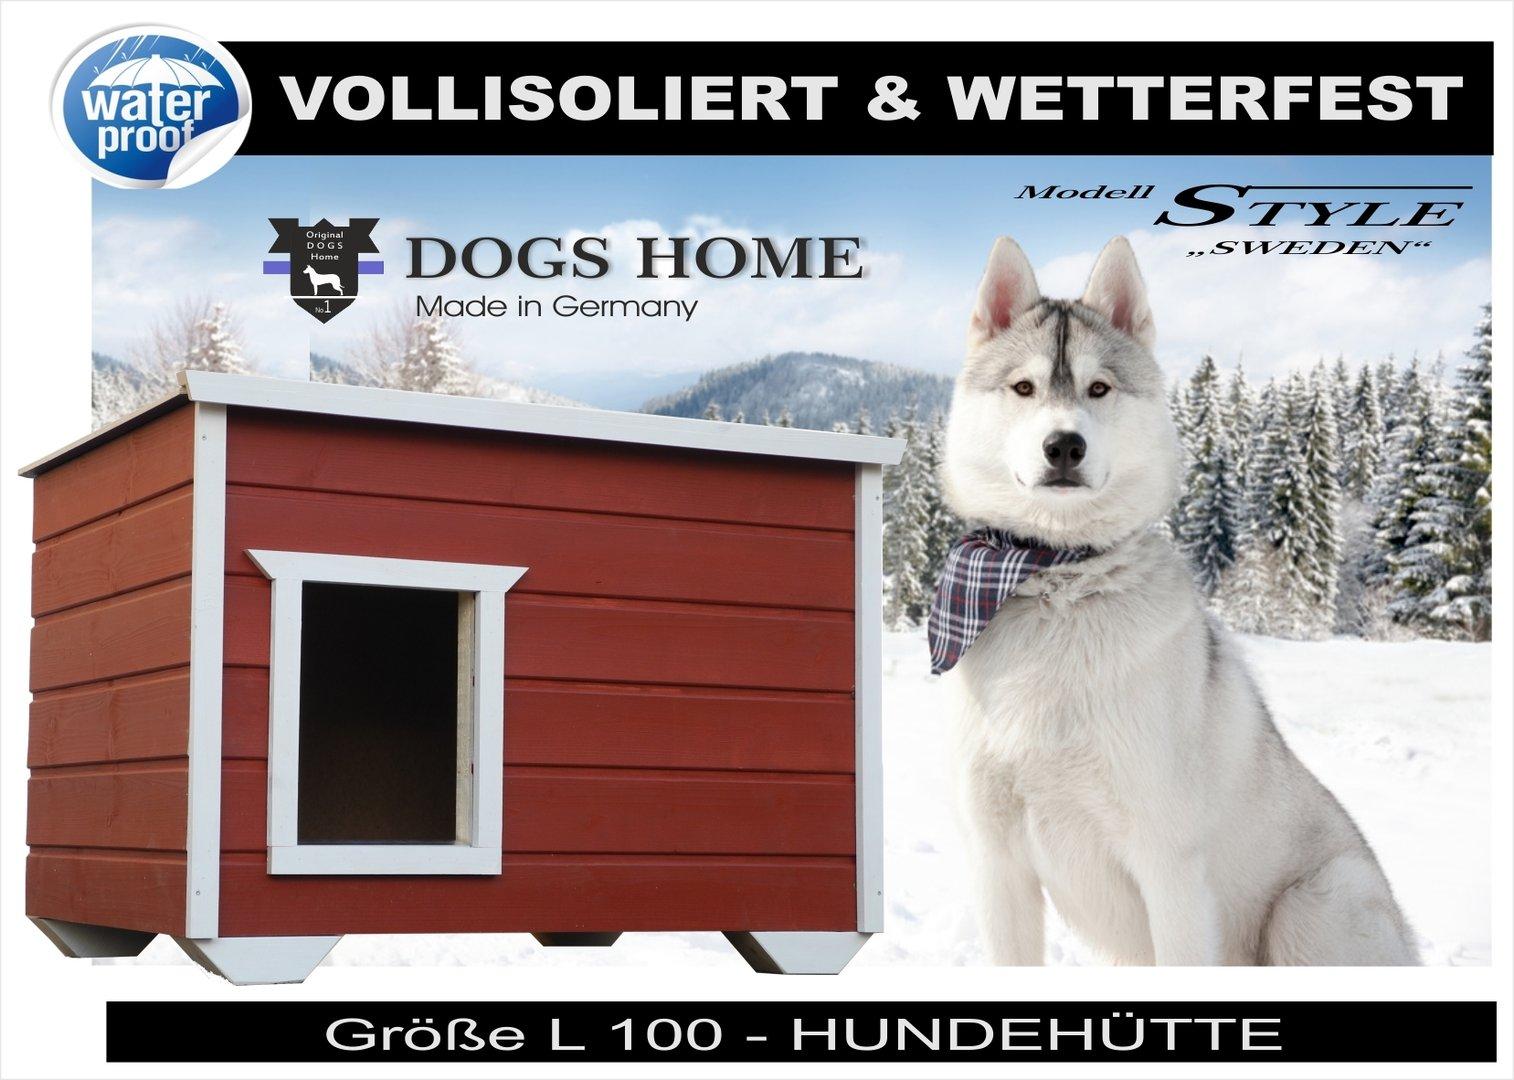 wie gro muss eine hundehtte sein gallery of kerbl hundehuette mit terrasse with wie gro muss. Black Bedroom Furniture Sets. Home Design Ideas